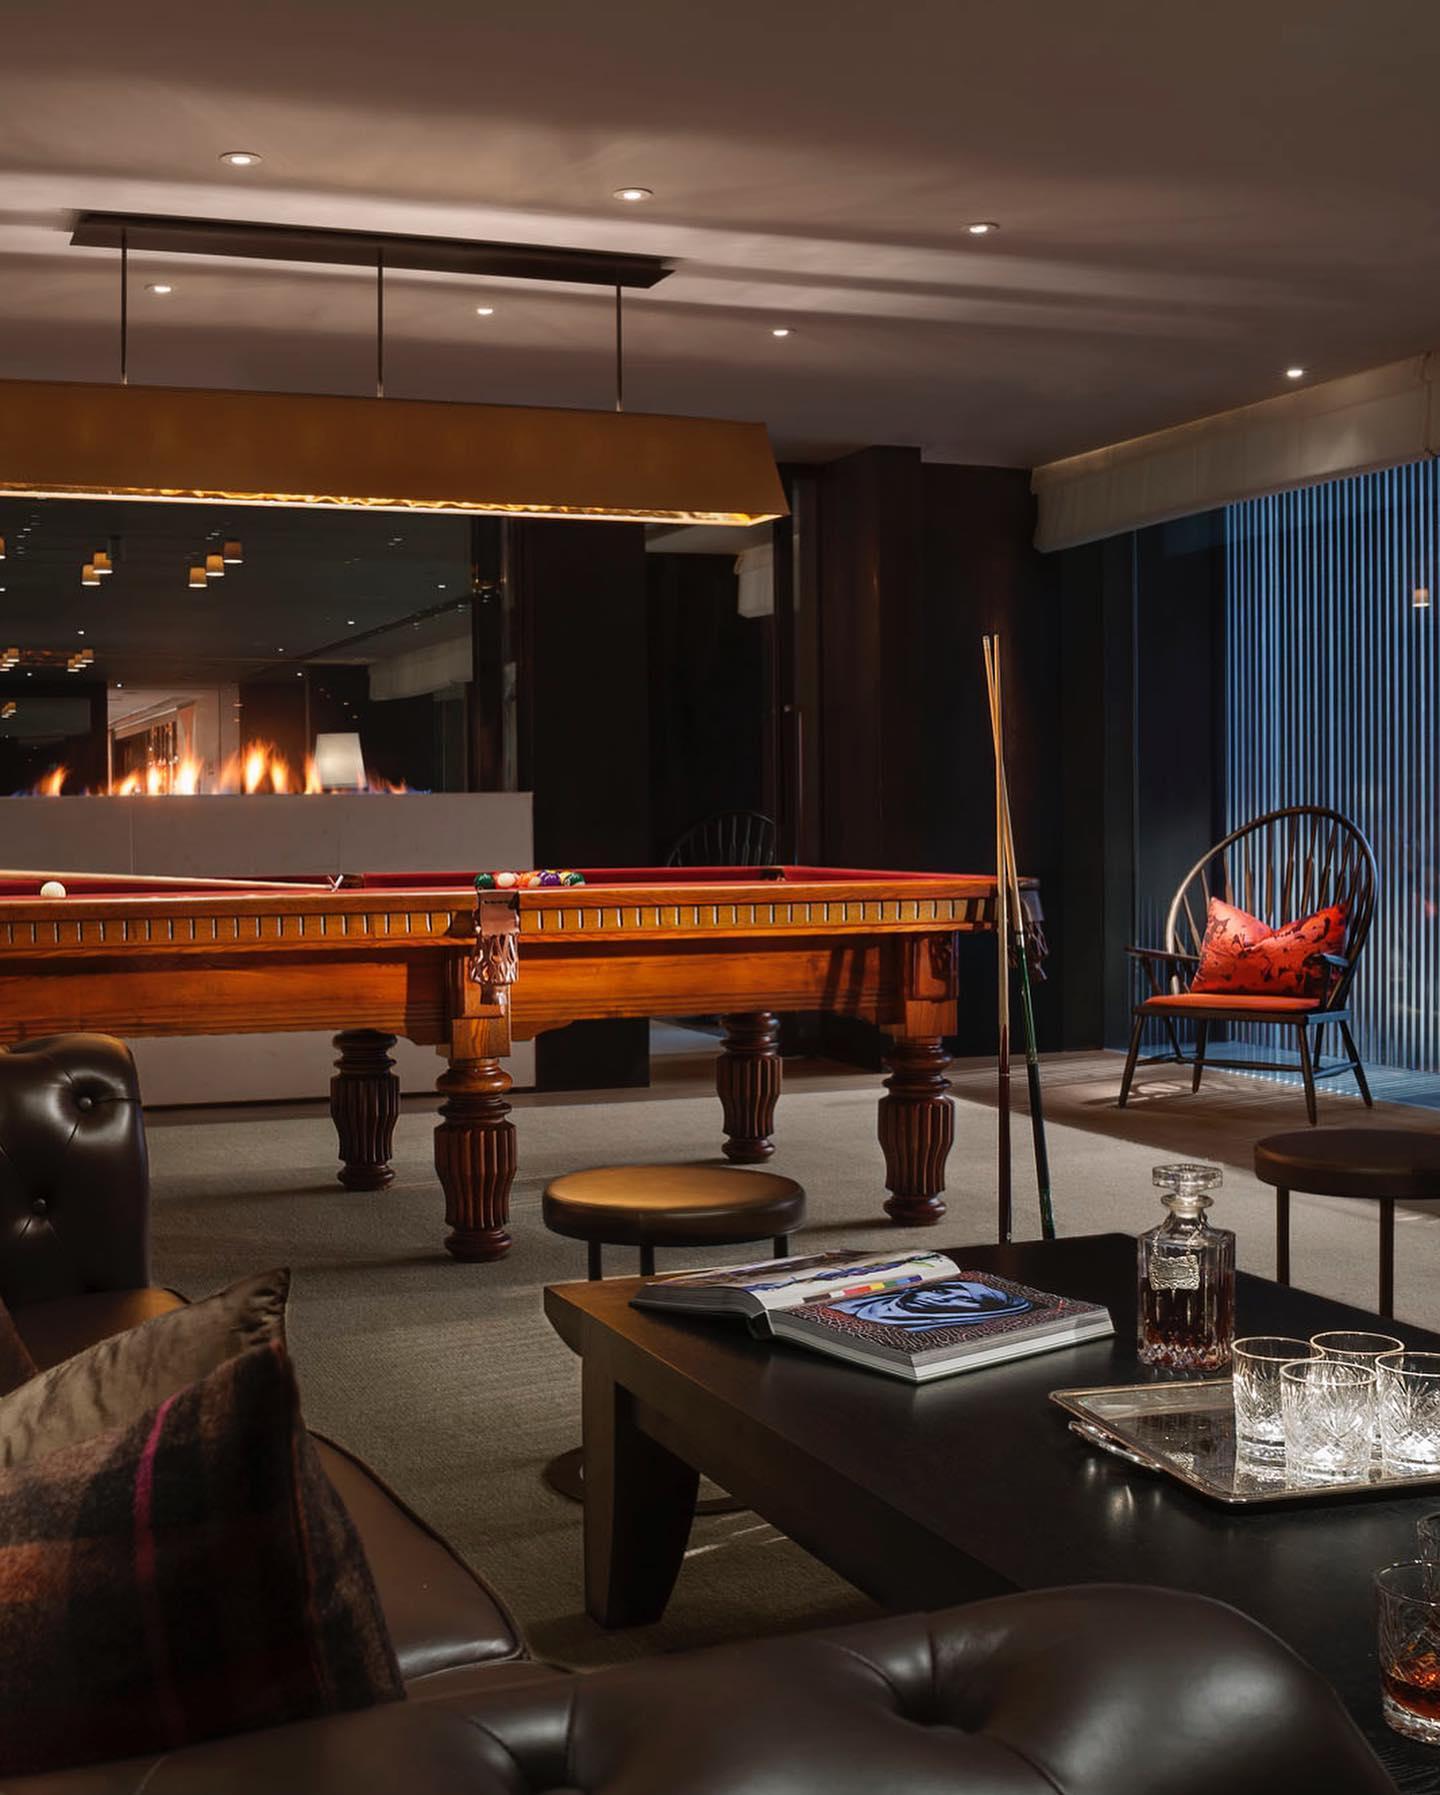 Rosewood Beijing, luna de miel en China, hoteles para luna de miel en China - Wedding Hub - 016